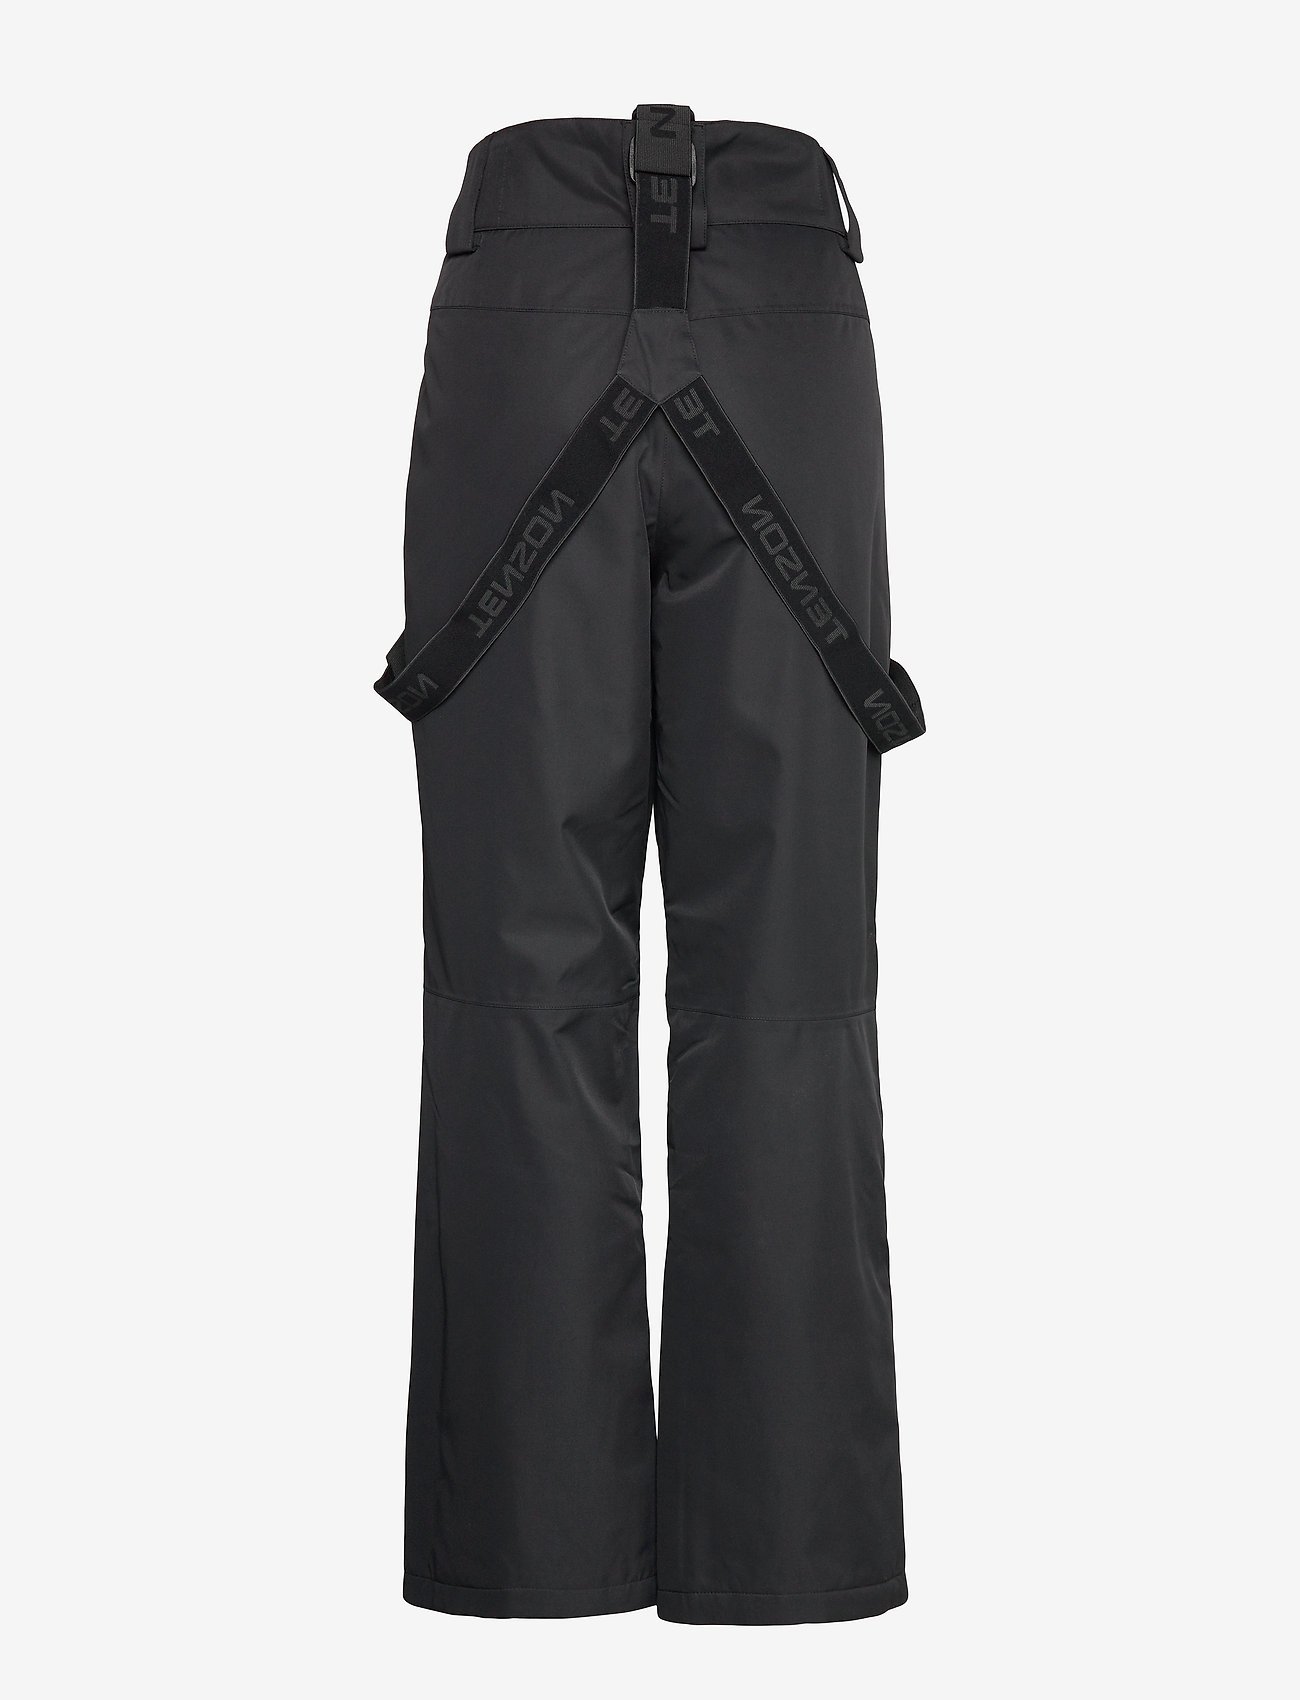 Tenson - Mirabel - spodnie narciarskie - black - 1